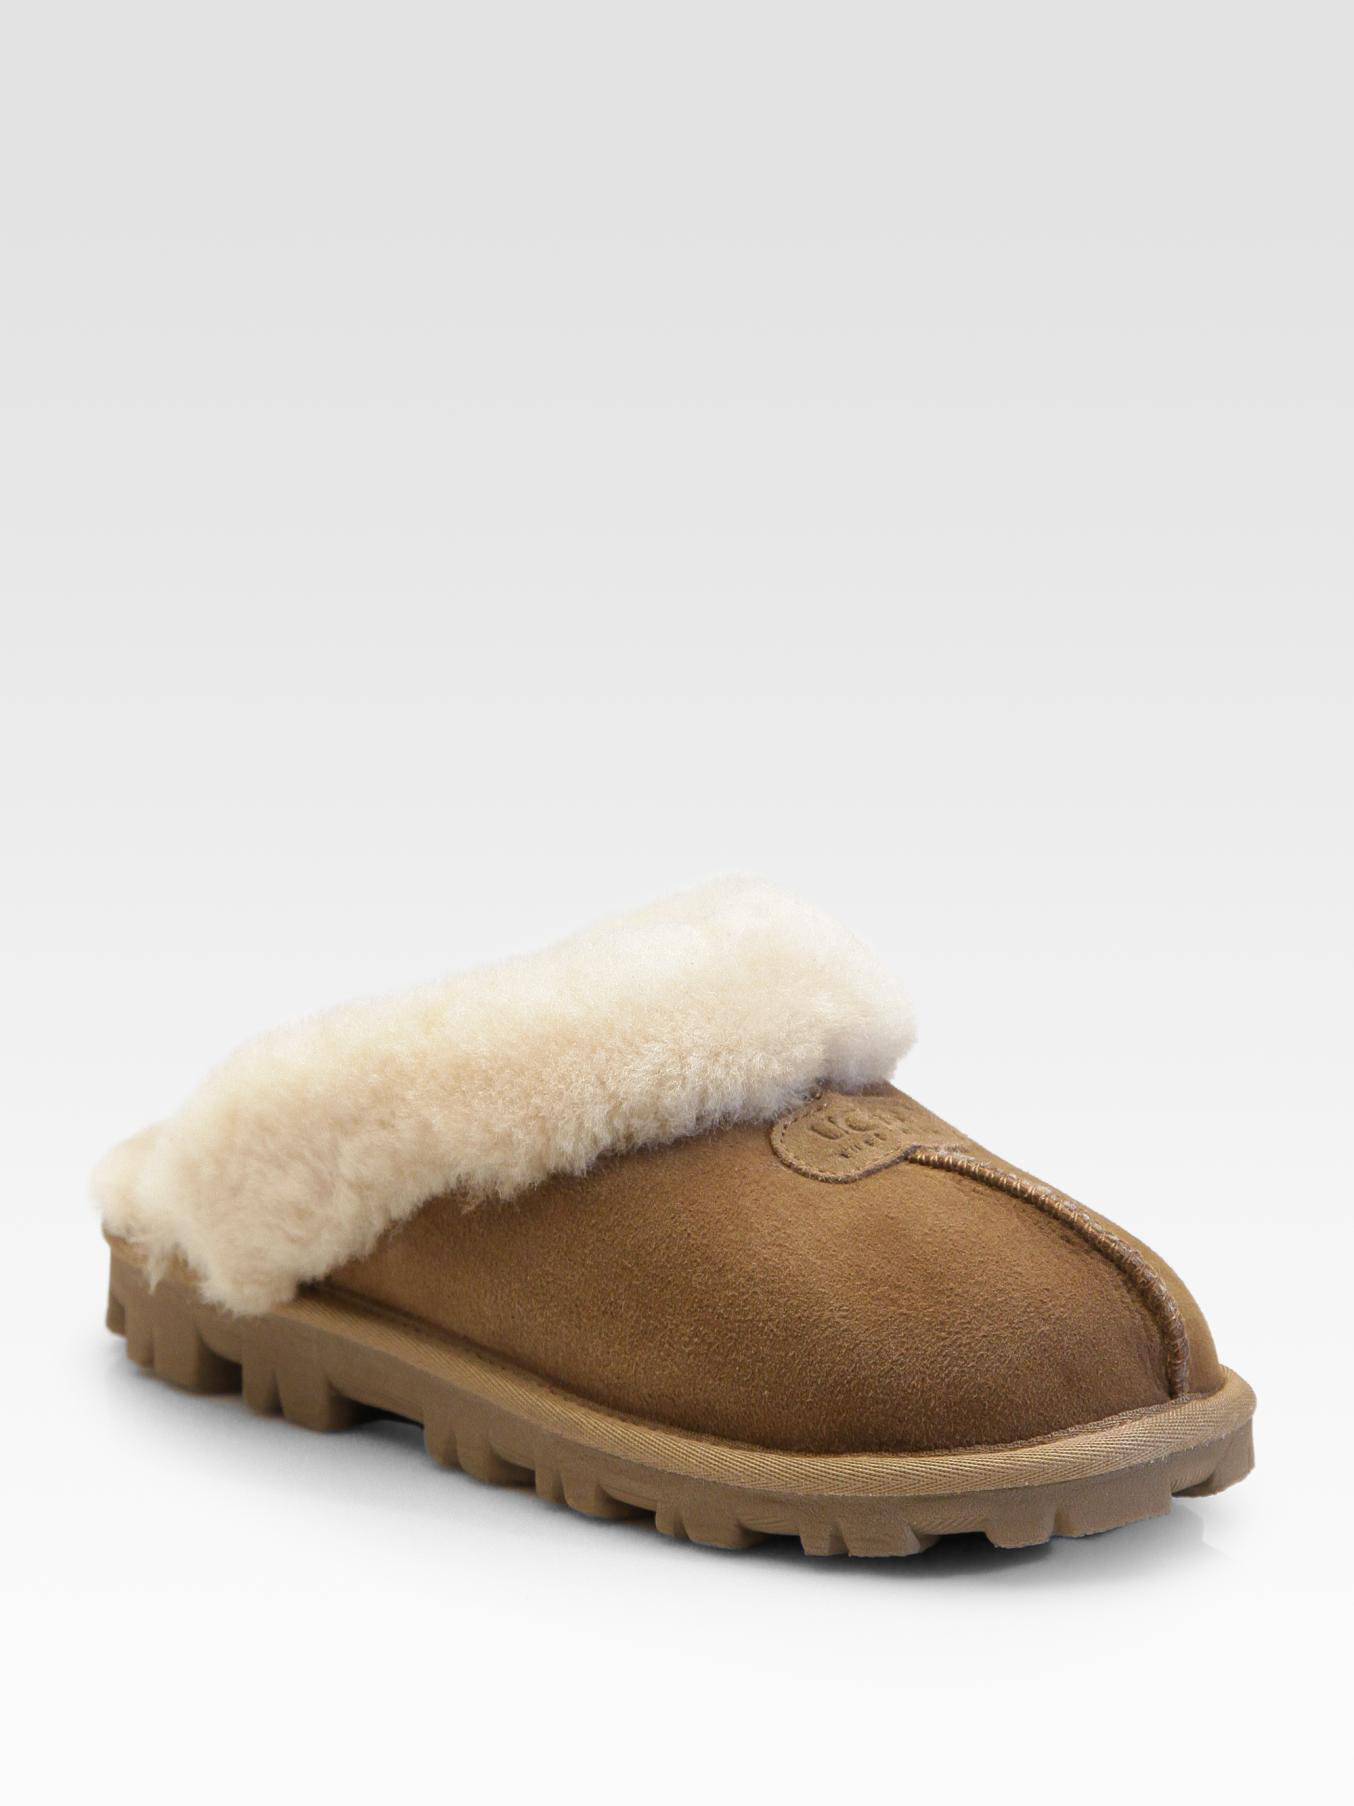 ugg sheepskin moccasins